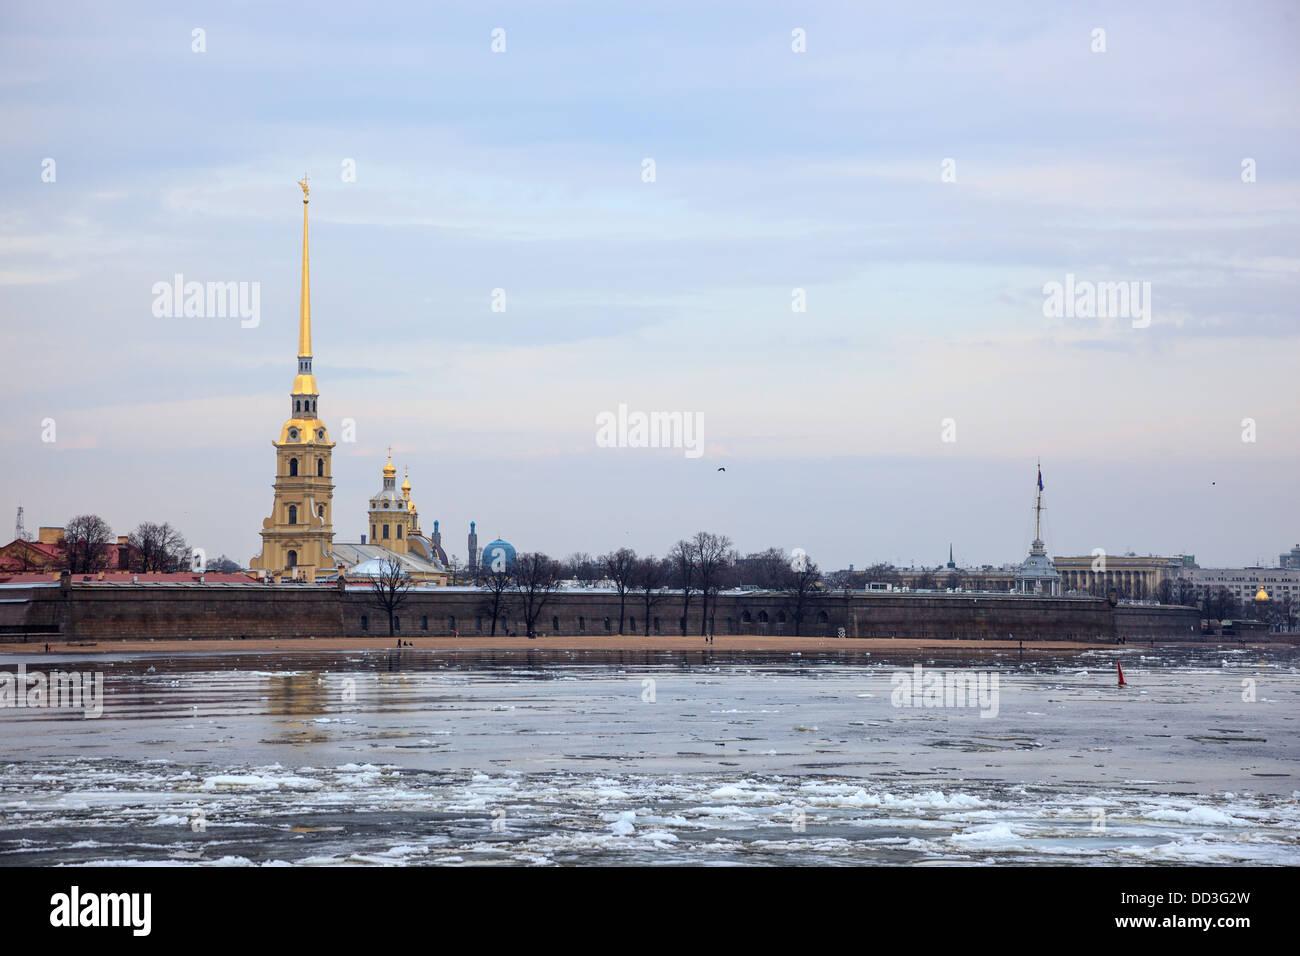 Saint Petersburg (Sankt-Peterburg), Russia. The neighborhood of St. Petersburg. Views of the City. Stock Photo